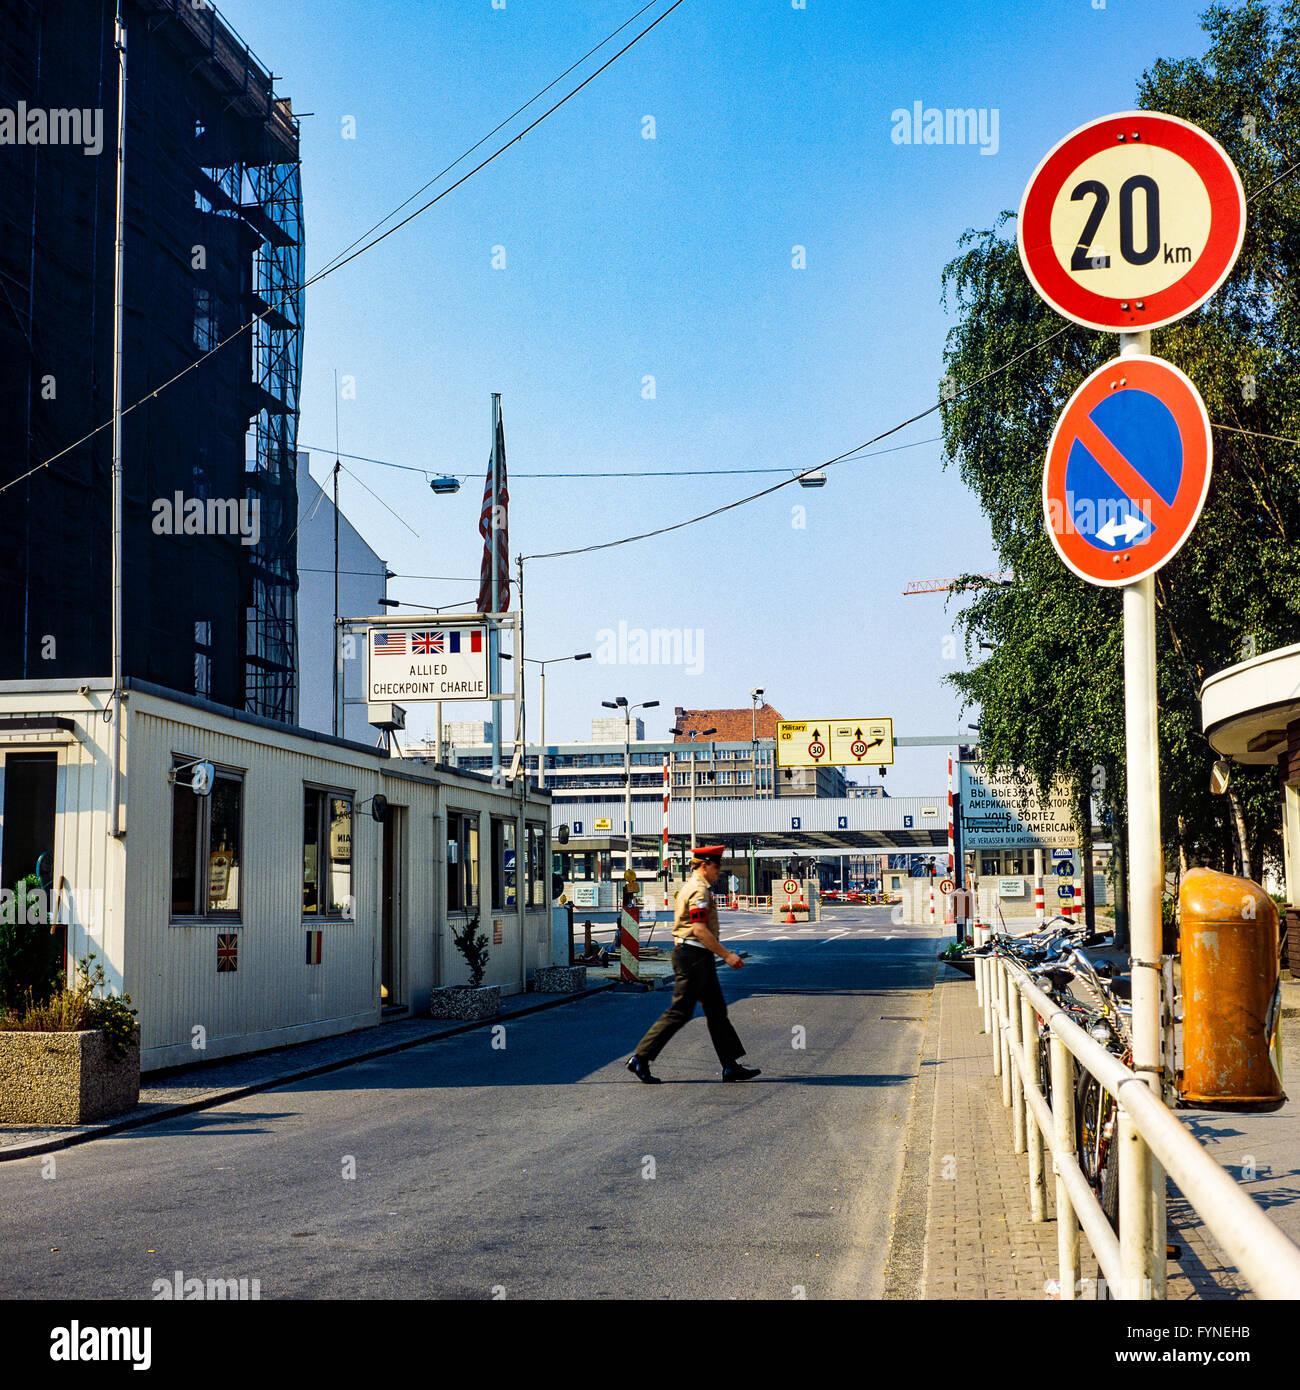 Agosto de 1986, Allied Checkpoint Charlie, la policía militar británica, la calle Friedrichstrasse, Kreuzberg, Imagen De Stock